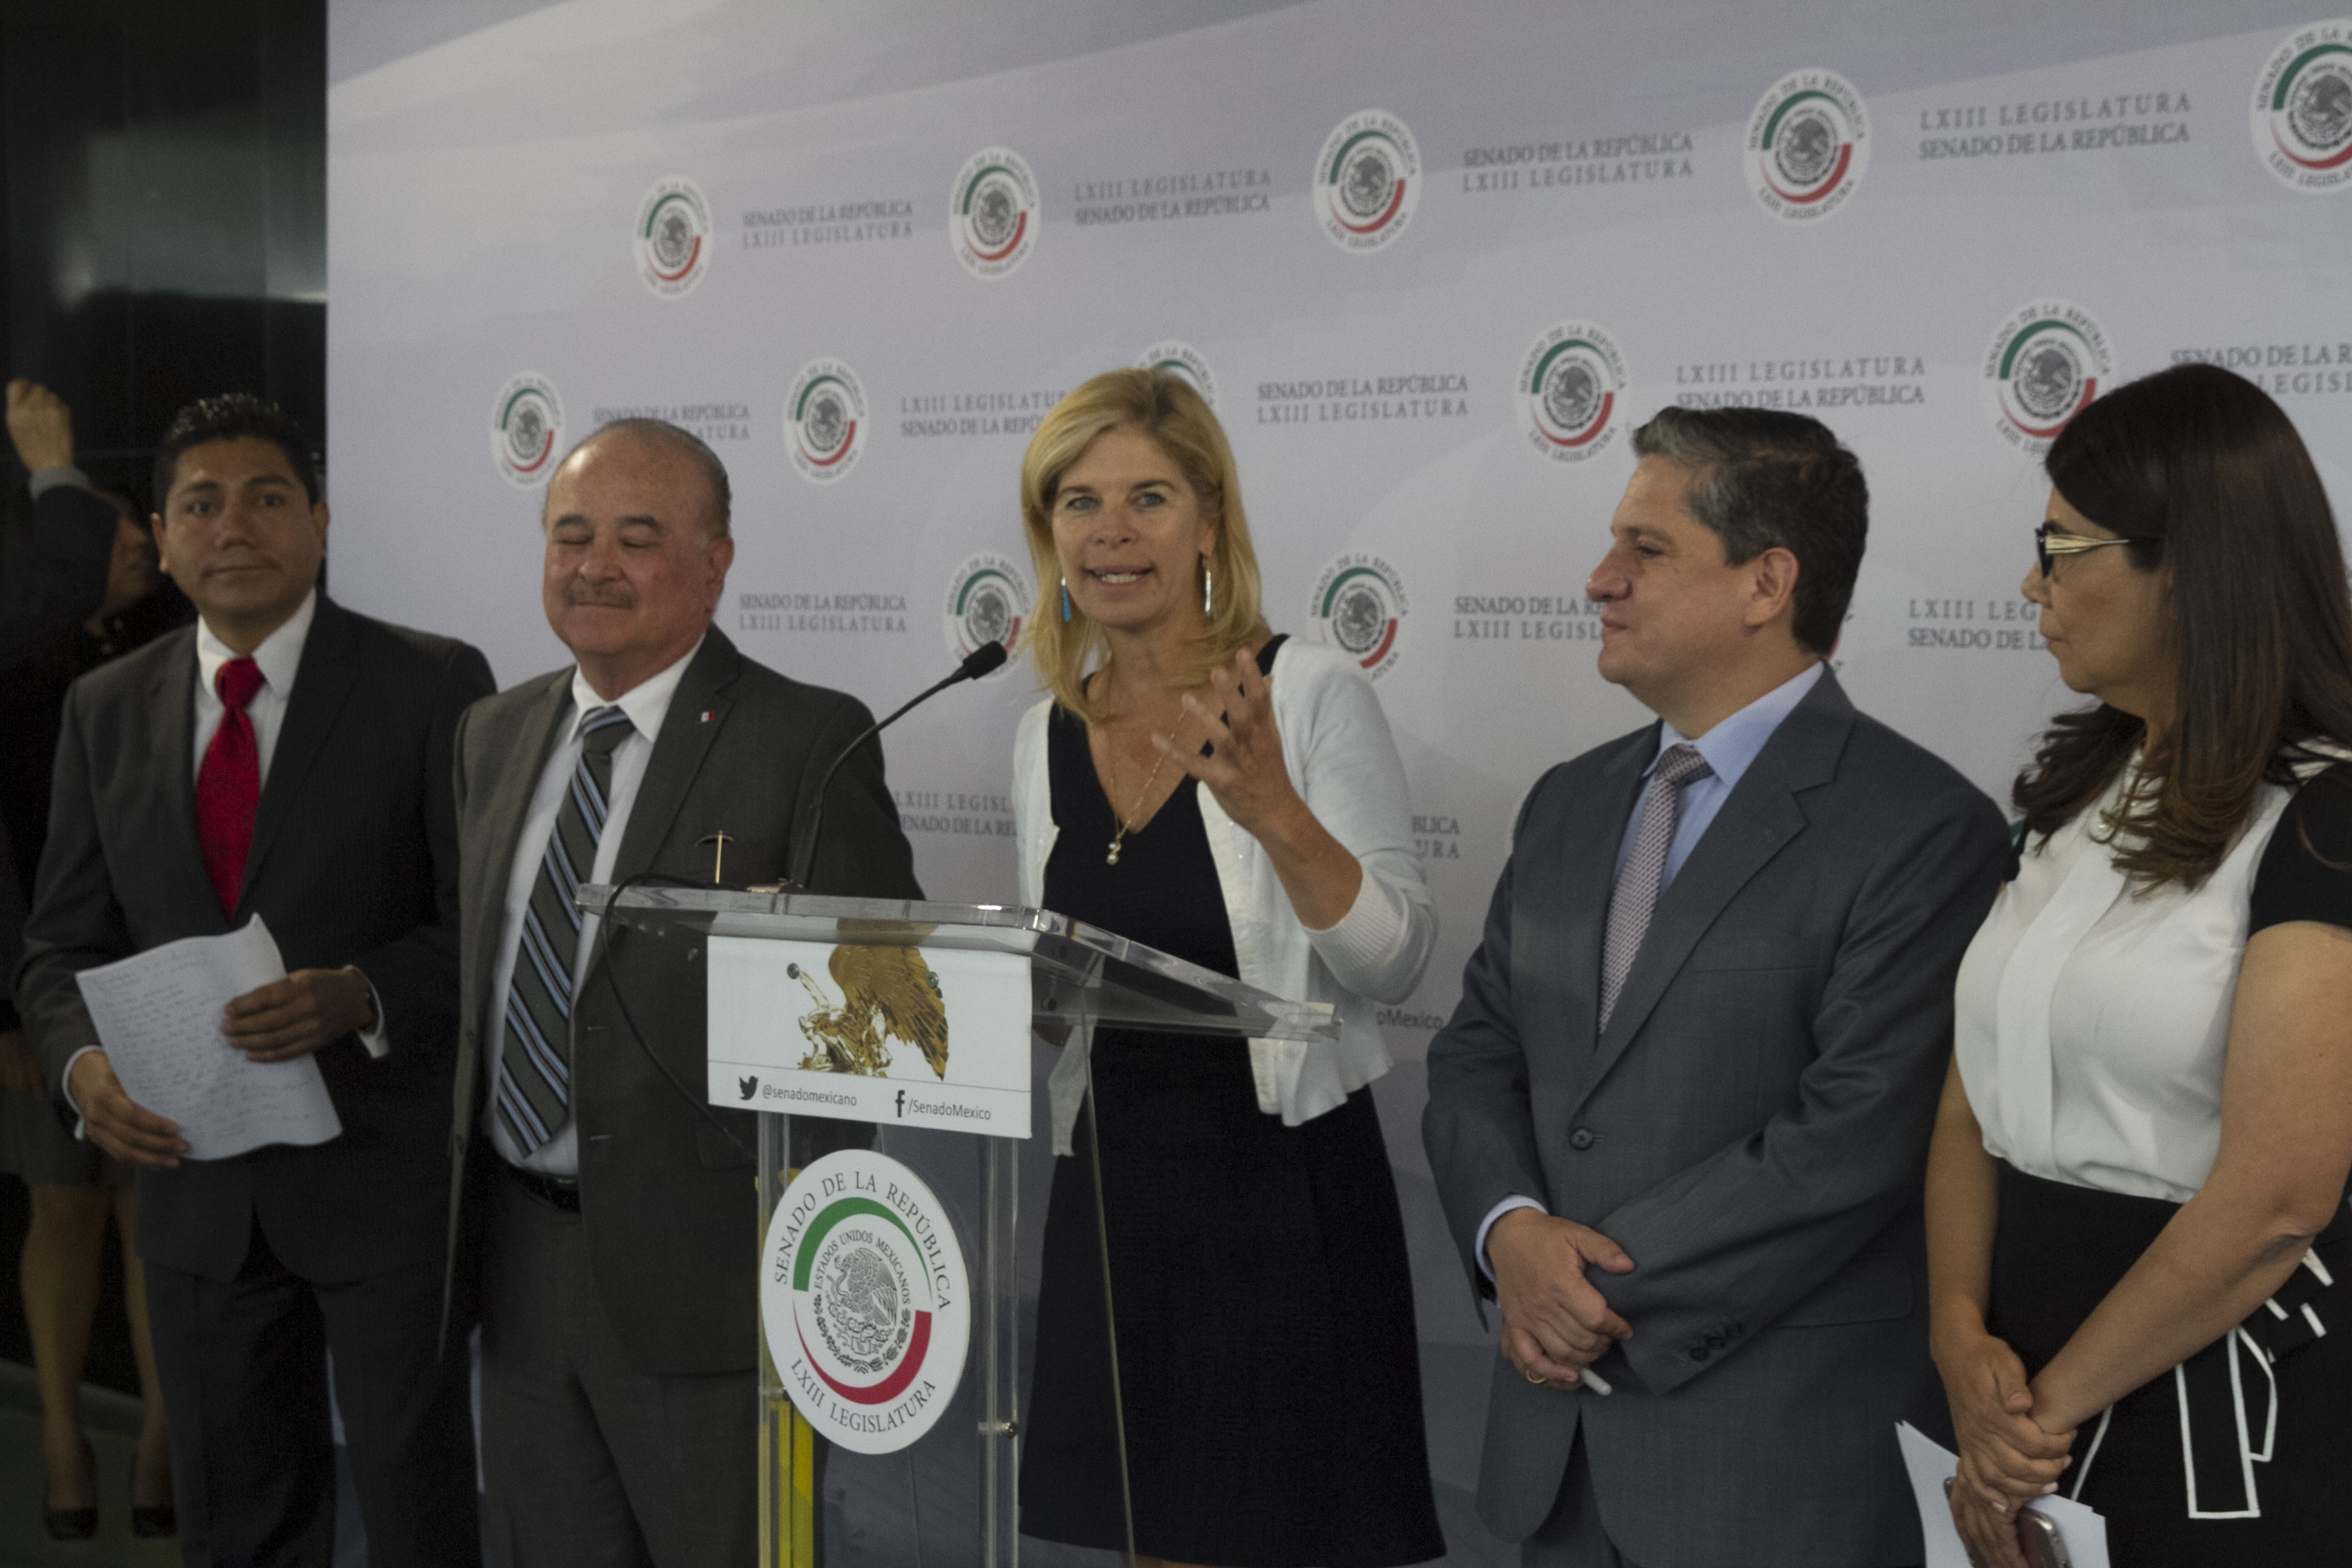 Jorge Luis Preciado, Ernesto Ruffo, Marcela Torres Peimbert.  FOTO: MOISÉS PABLO /CUARTOSCURO.COM